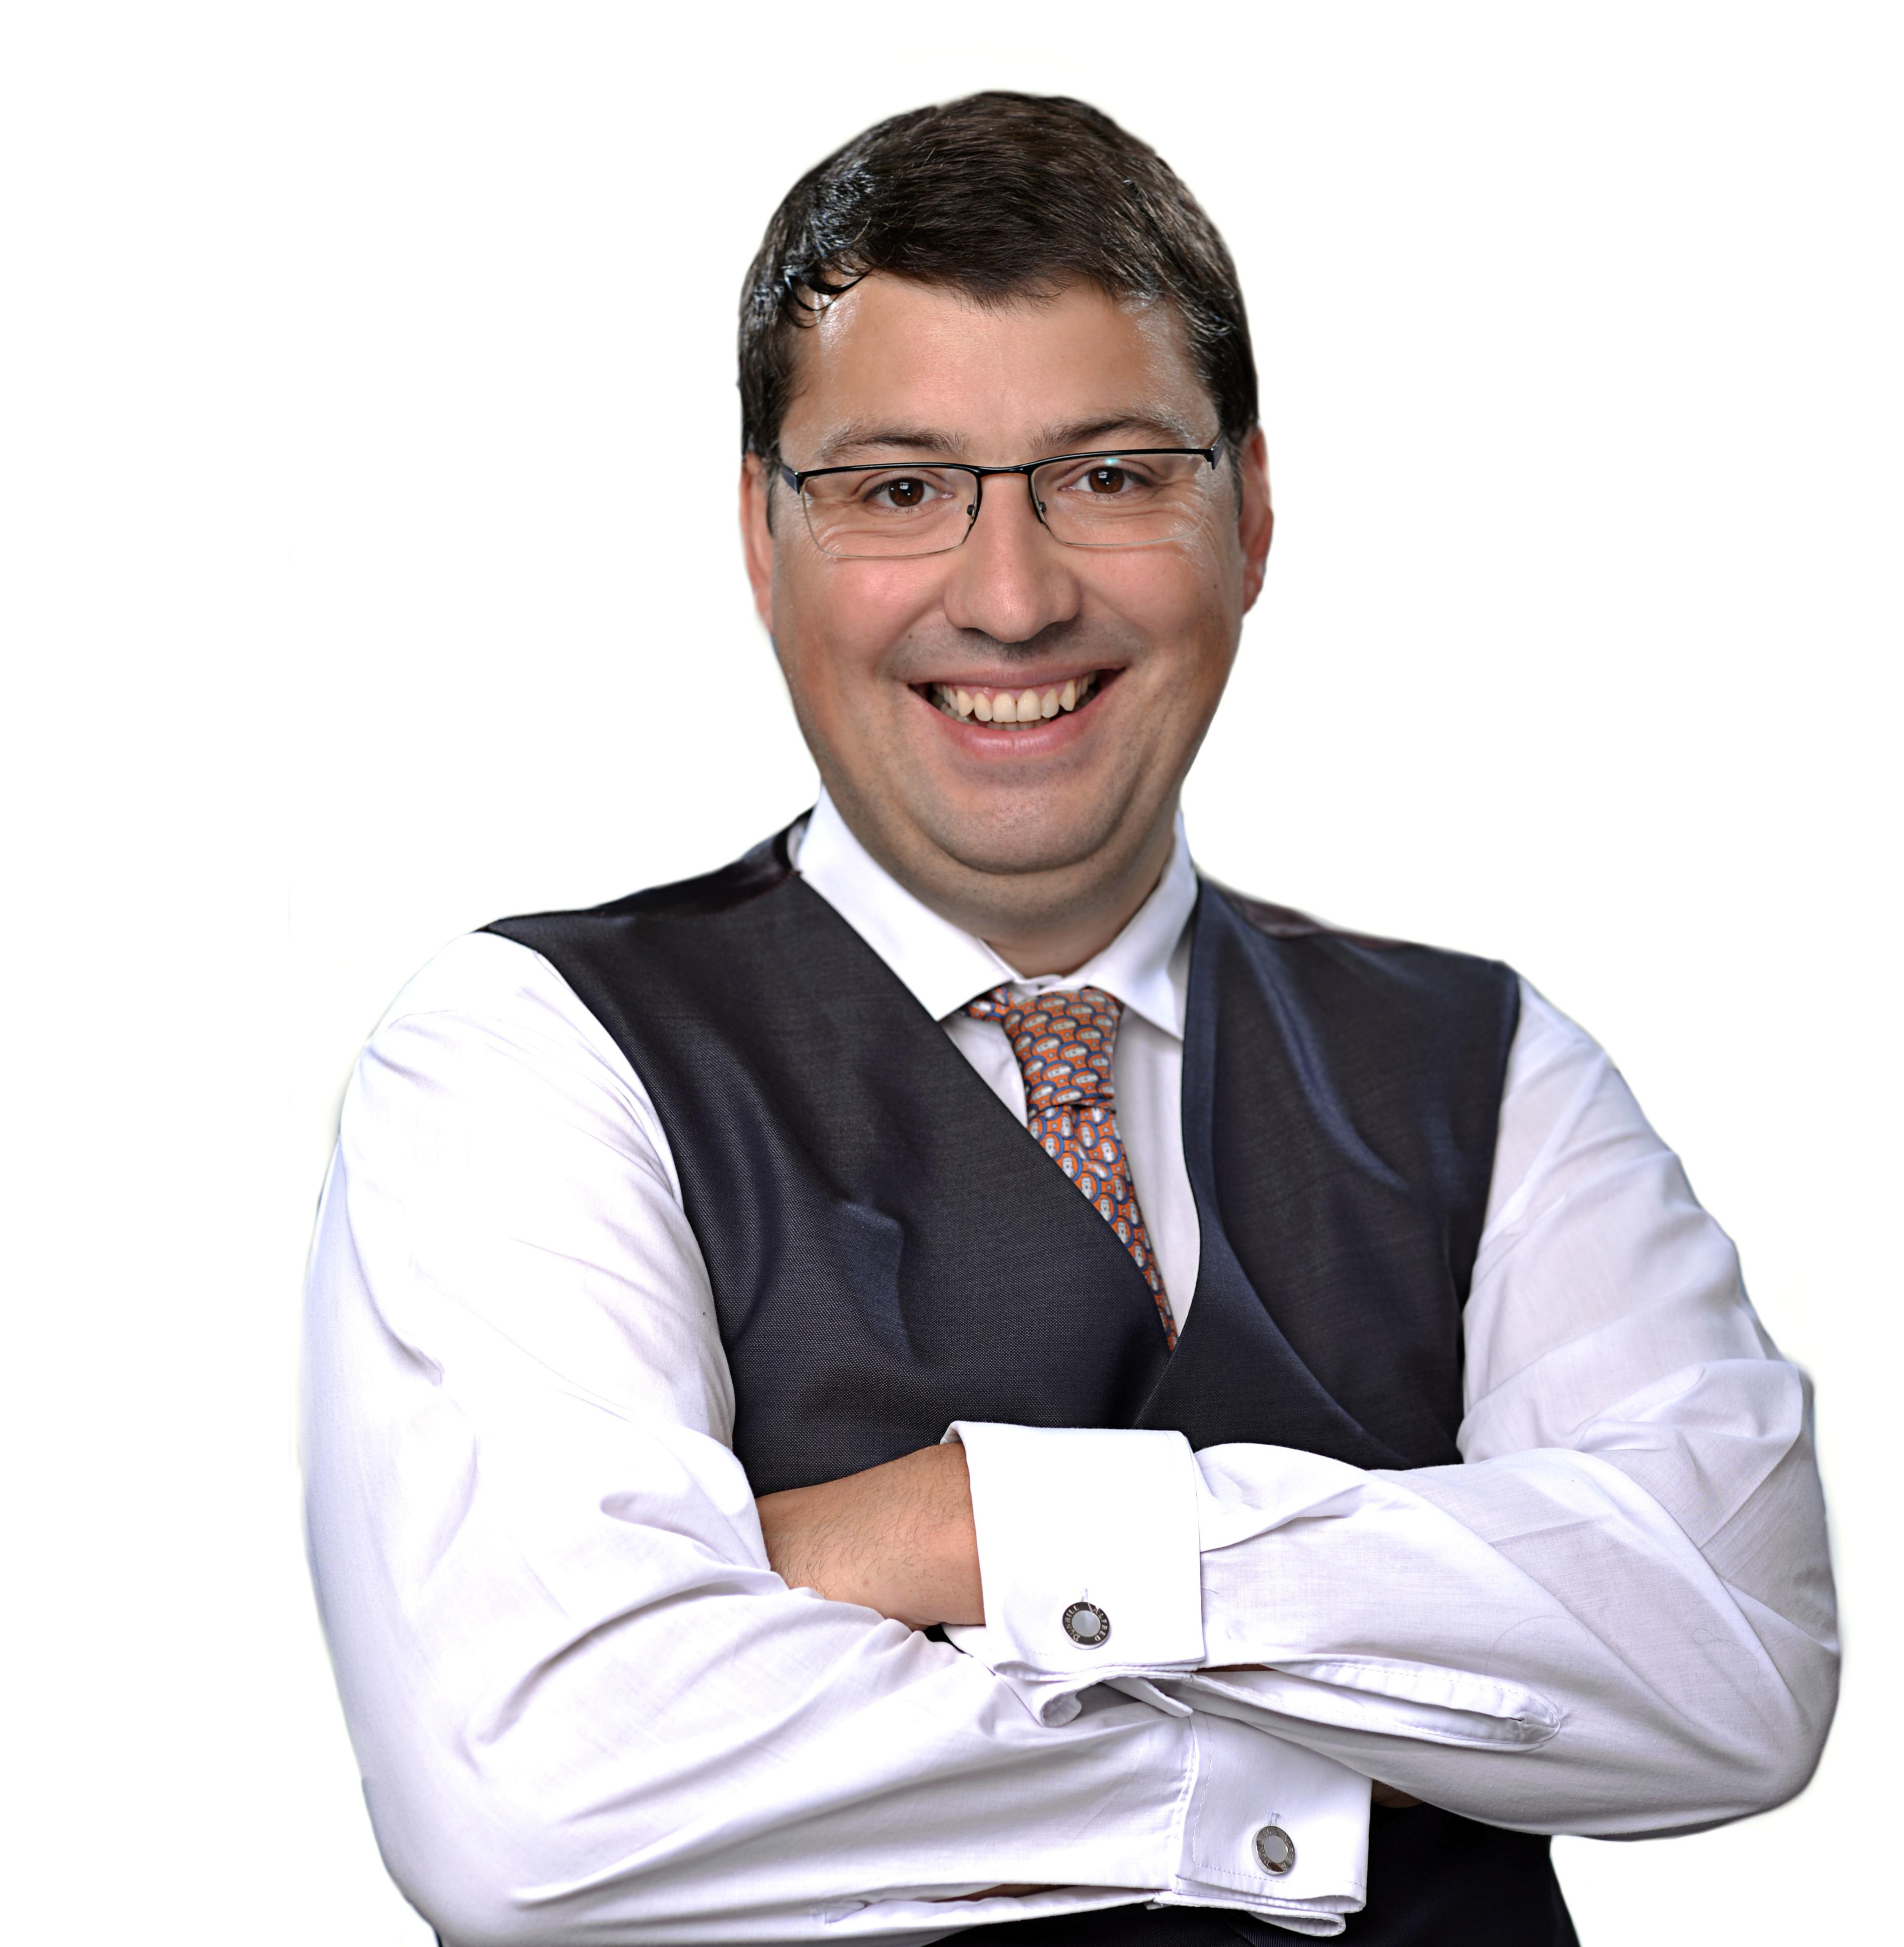 Юрий Никаненок